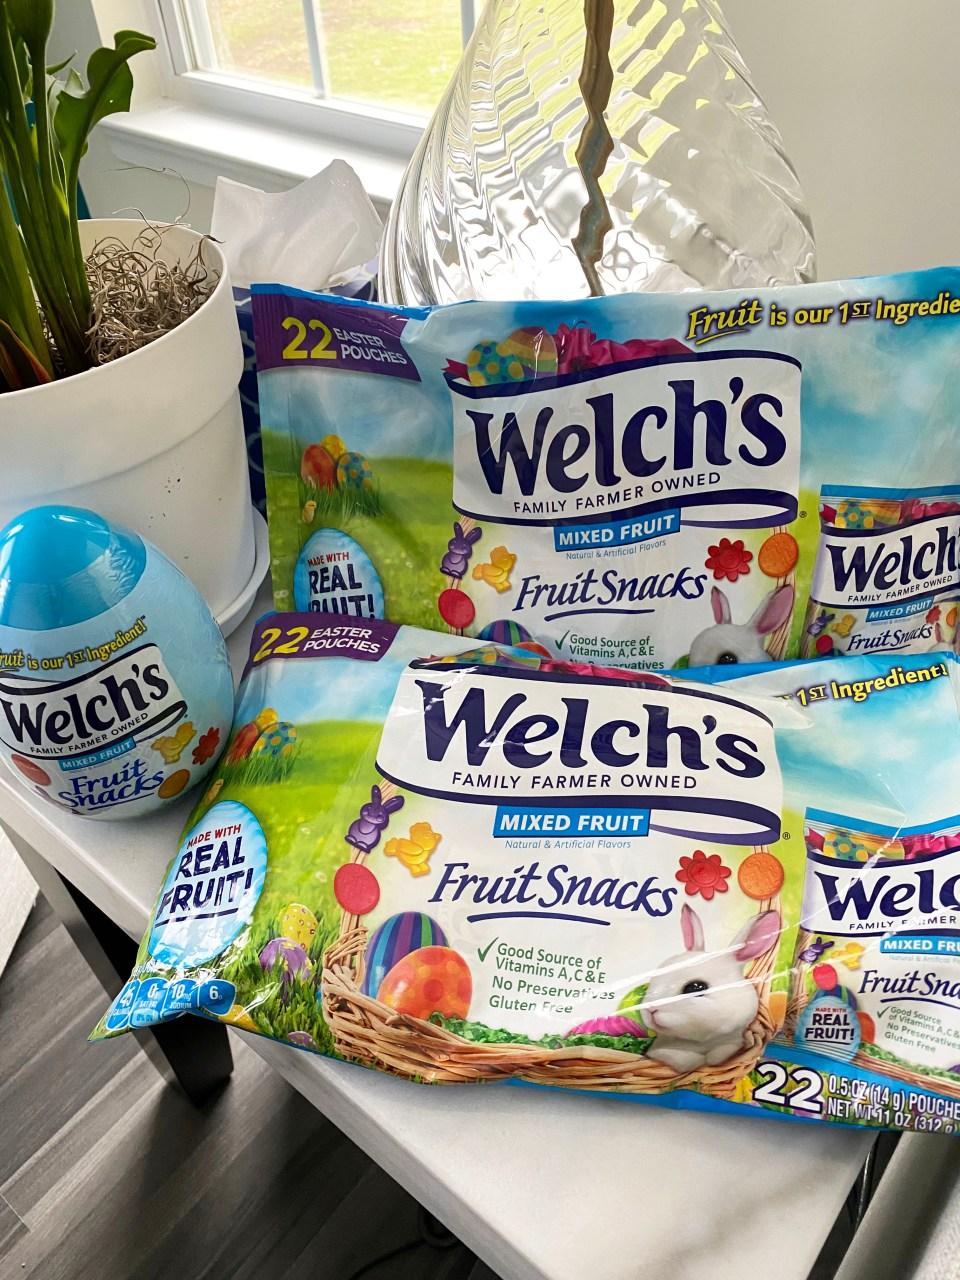 Welch's Easter Fruit Snacks 1